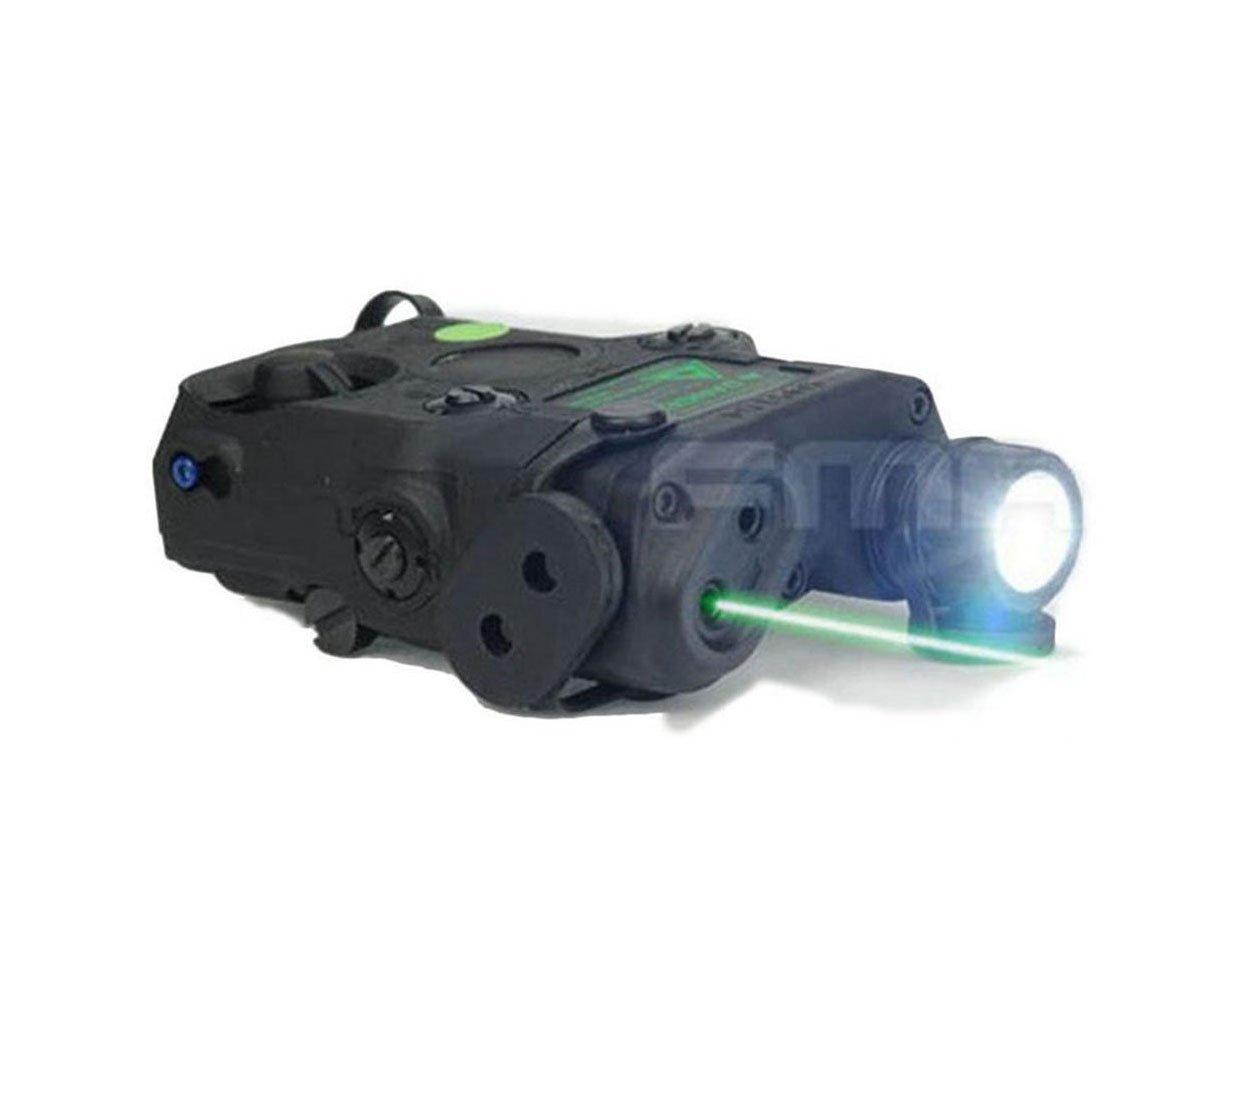 H World Shopping Airsoft PRO-LAS-PEQ-15 LED Flashlight Grn Laser Sight Black AEG GBB CQB